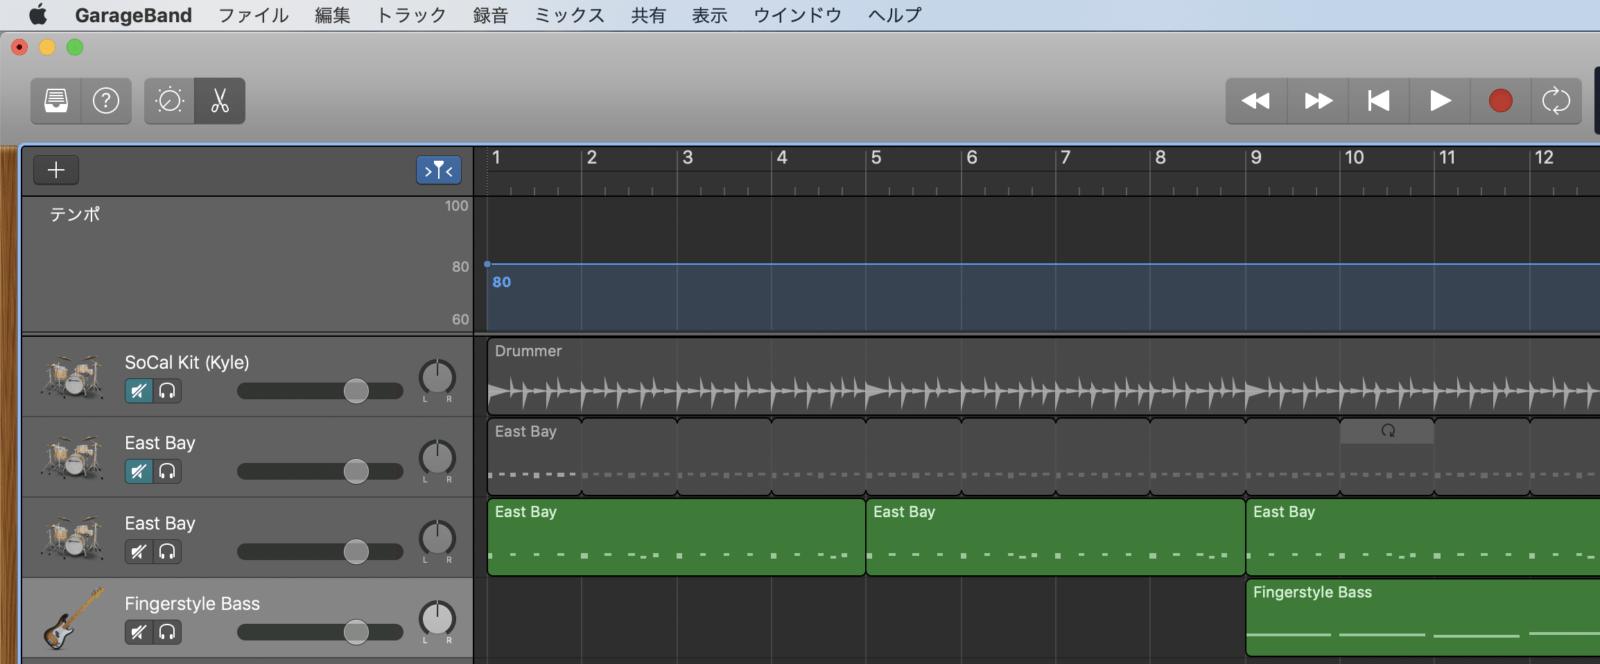 GarageBandで曲の途中から拍子を変更する方法